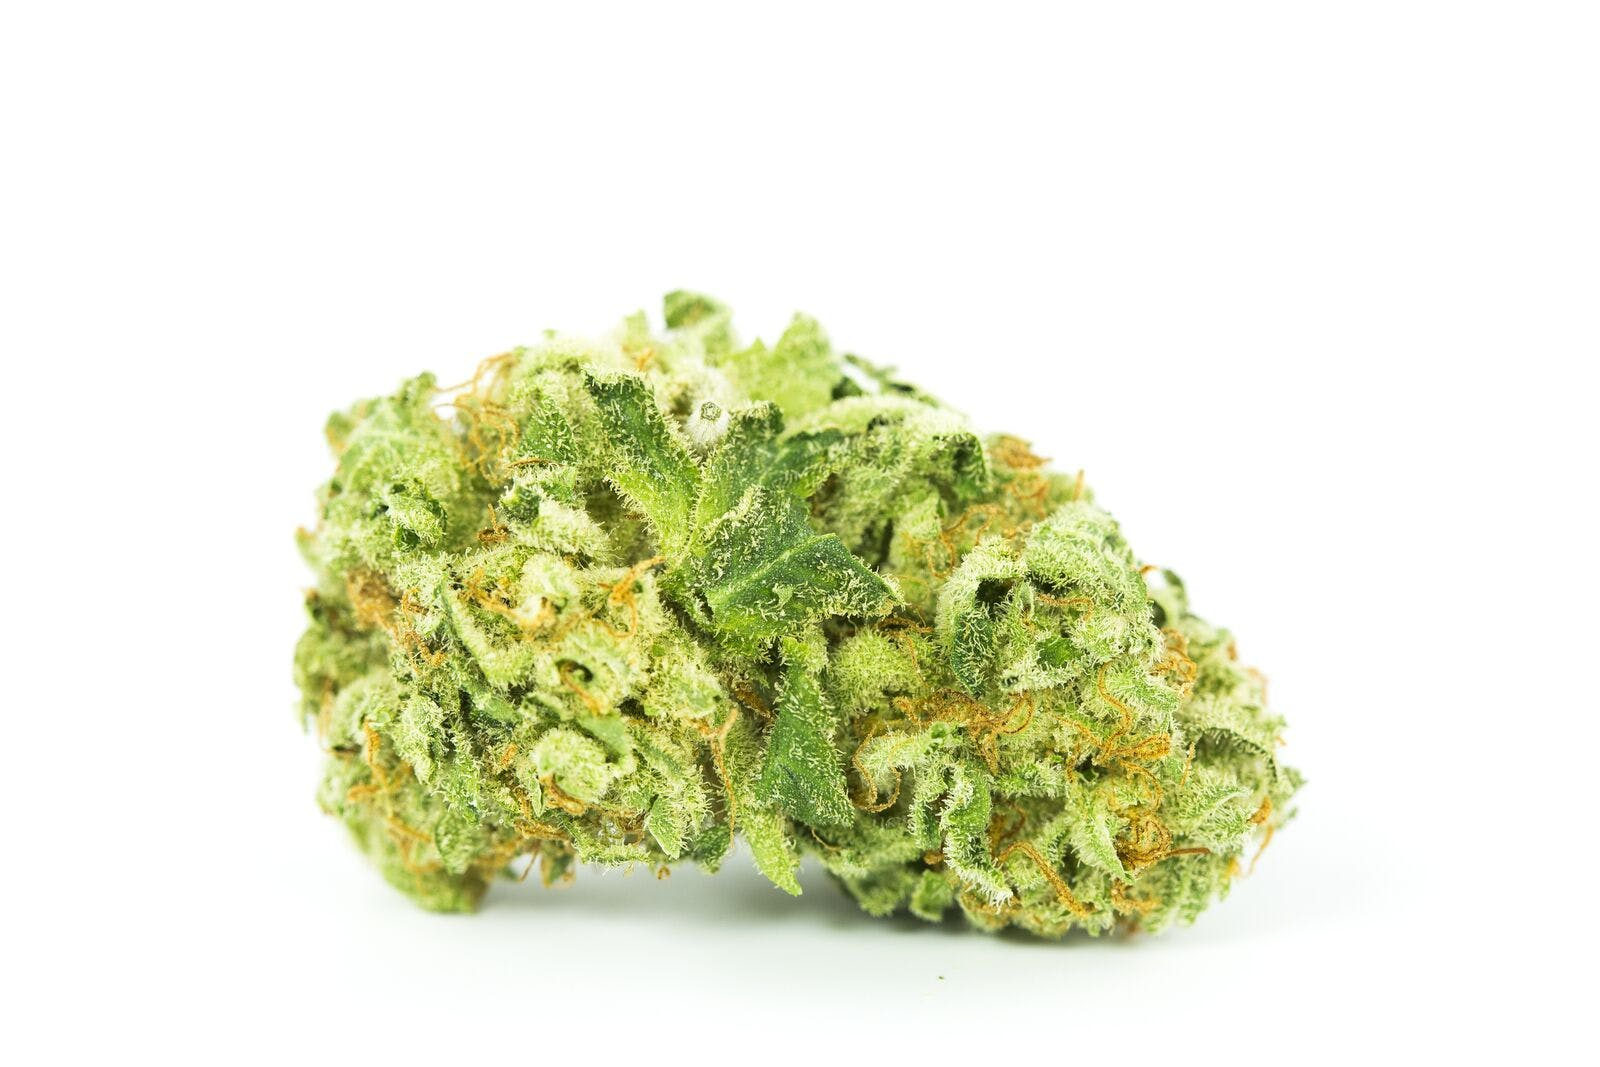 Amnesia Lemon Weed; Amnesia Lemon Cannabis Strain; Amnesia Lemon Sativa Marijuana Strain